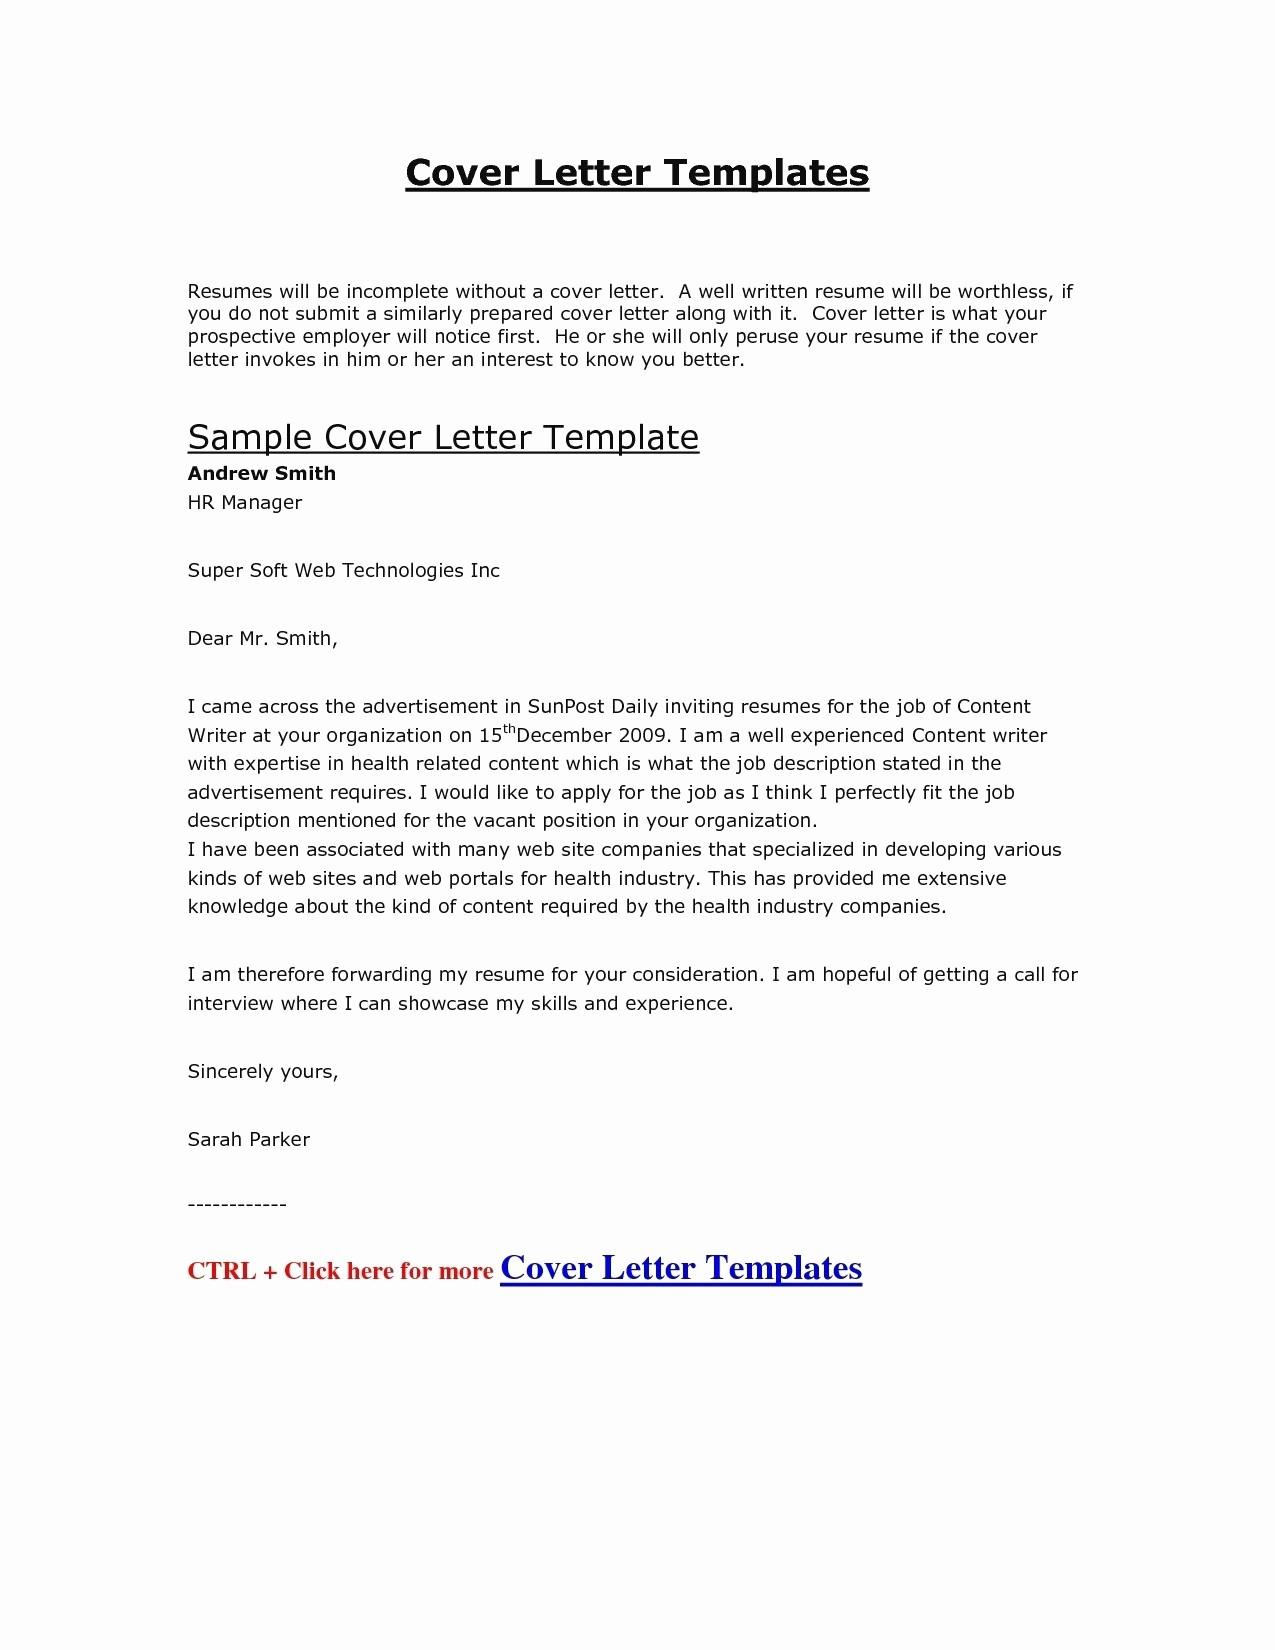 Sample Cover Letter Template - Job Application Letter format Template Copy Cover Letter Template Hr